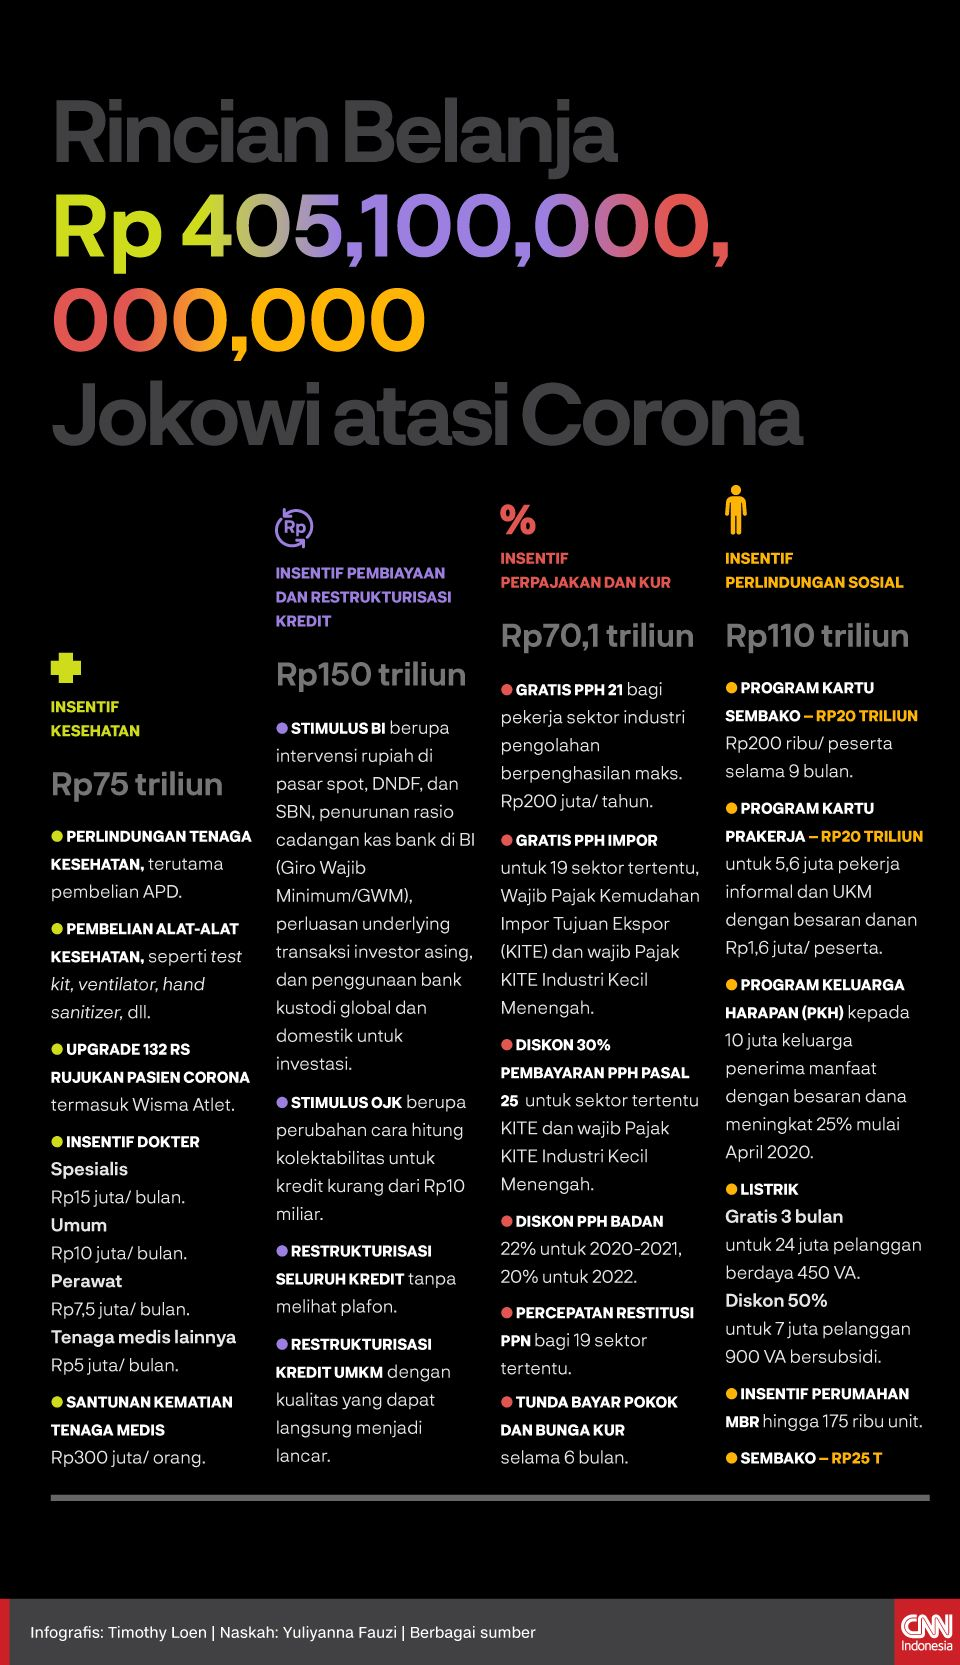 Infografis Rincian Belanja Rp405,1 T Jokowi untuk Atasi Corona